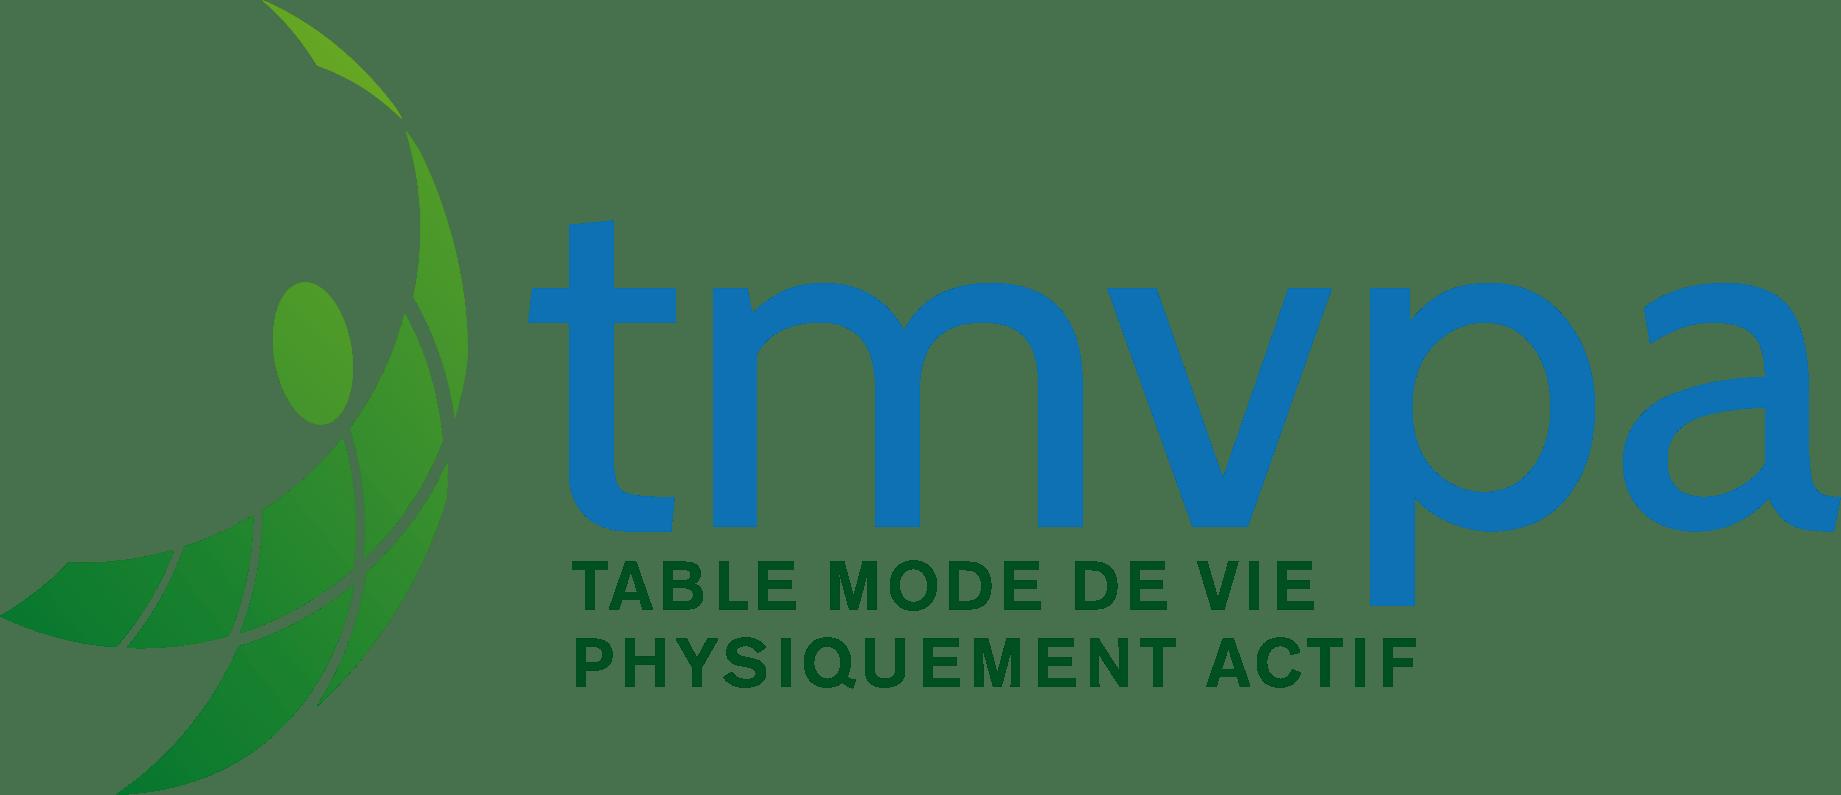 https://vifamagazine.ca/app/uploads/legacy/documents/images/logo-tmvpa-page-para.png